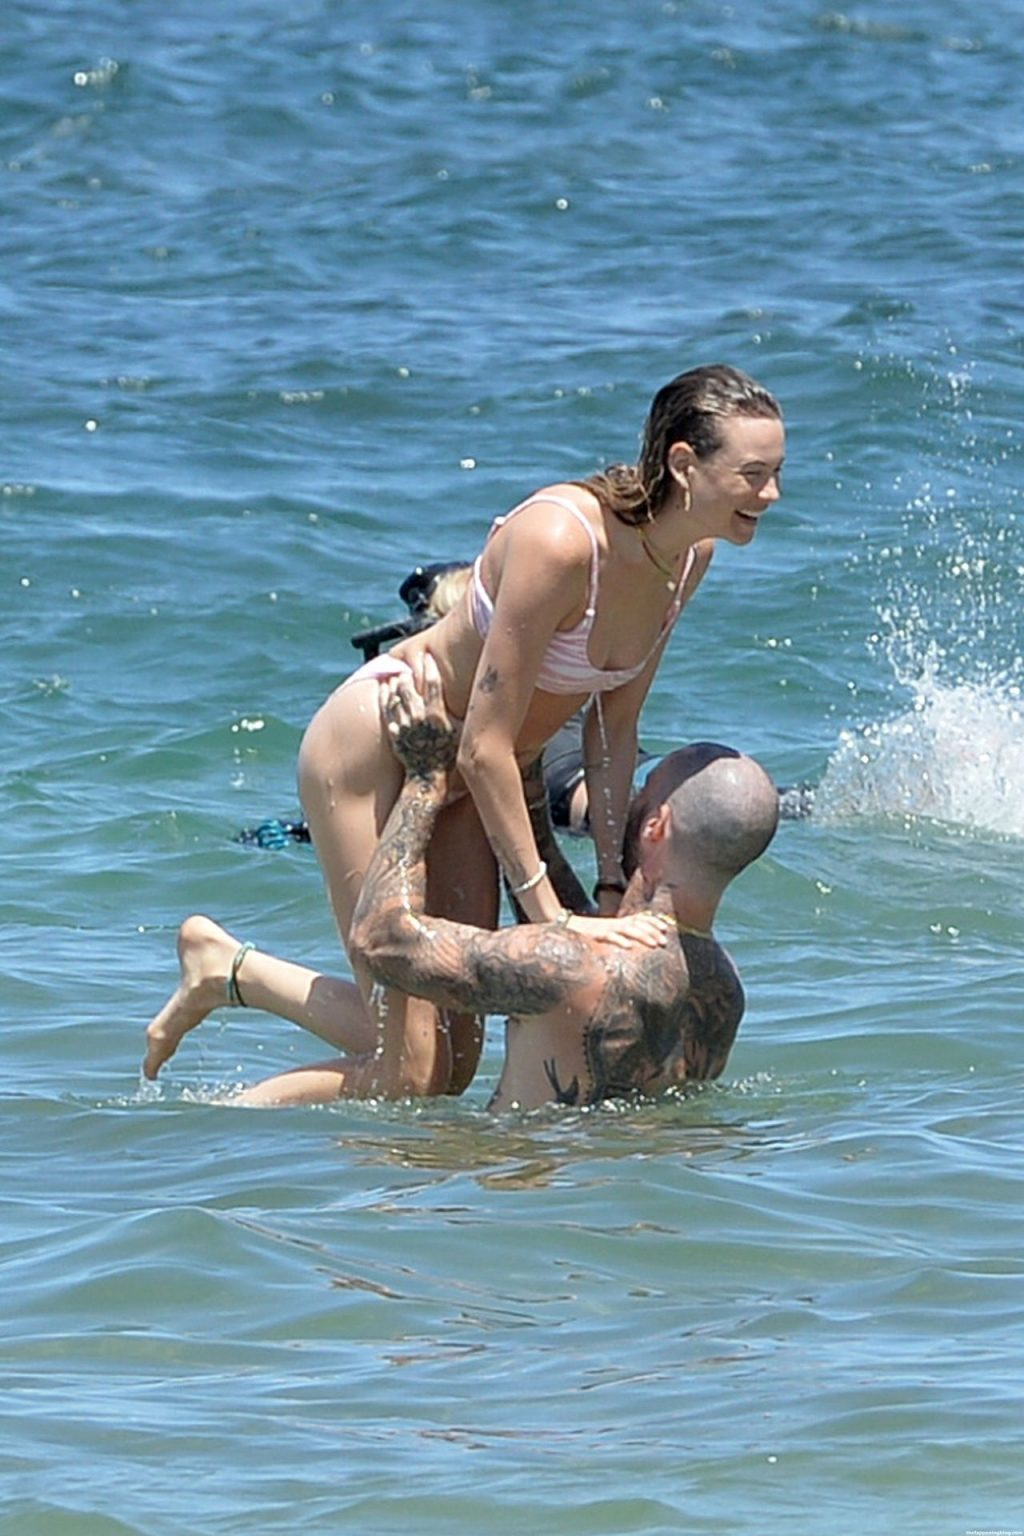 Behati Prinsloo & Adam Levine Are Having a Blast in Hawaii (13 Photos)